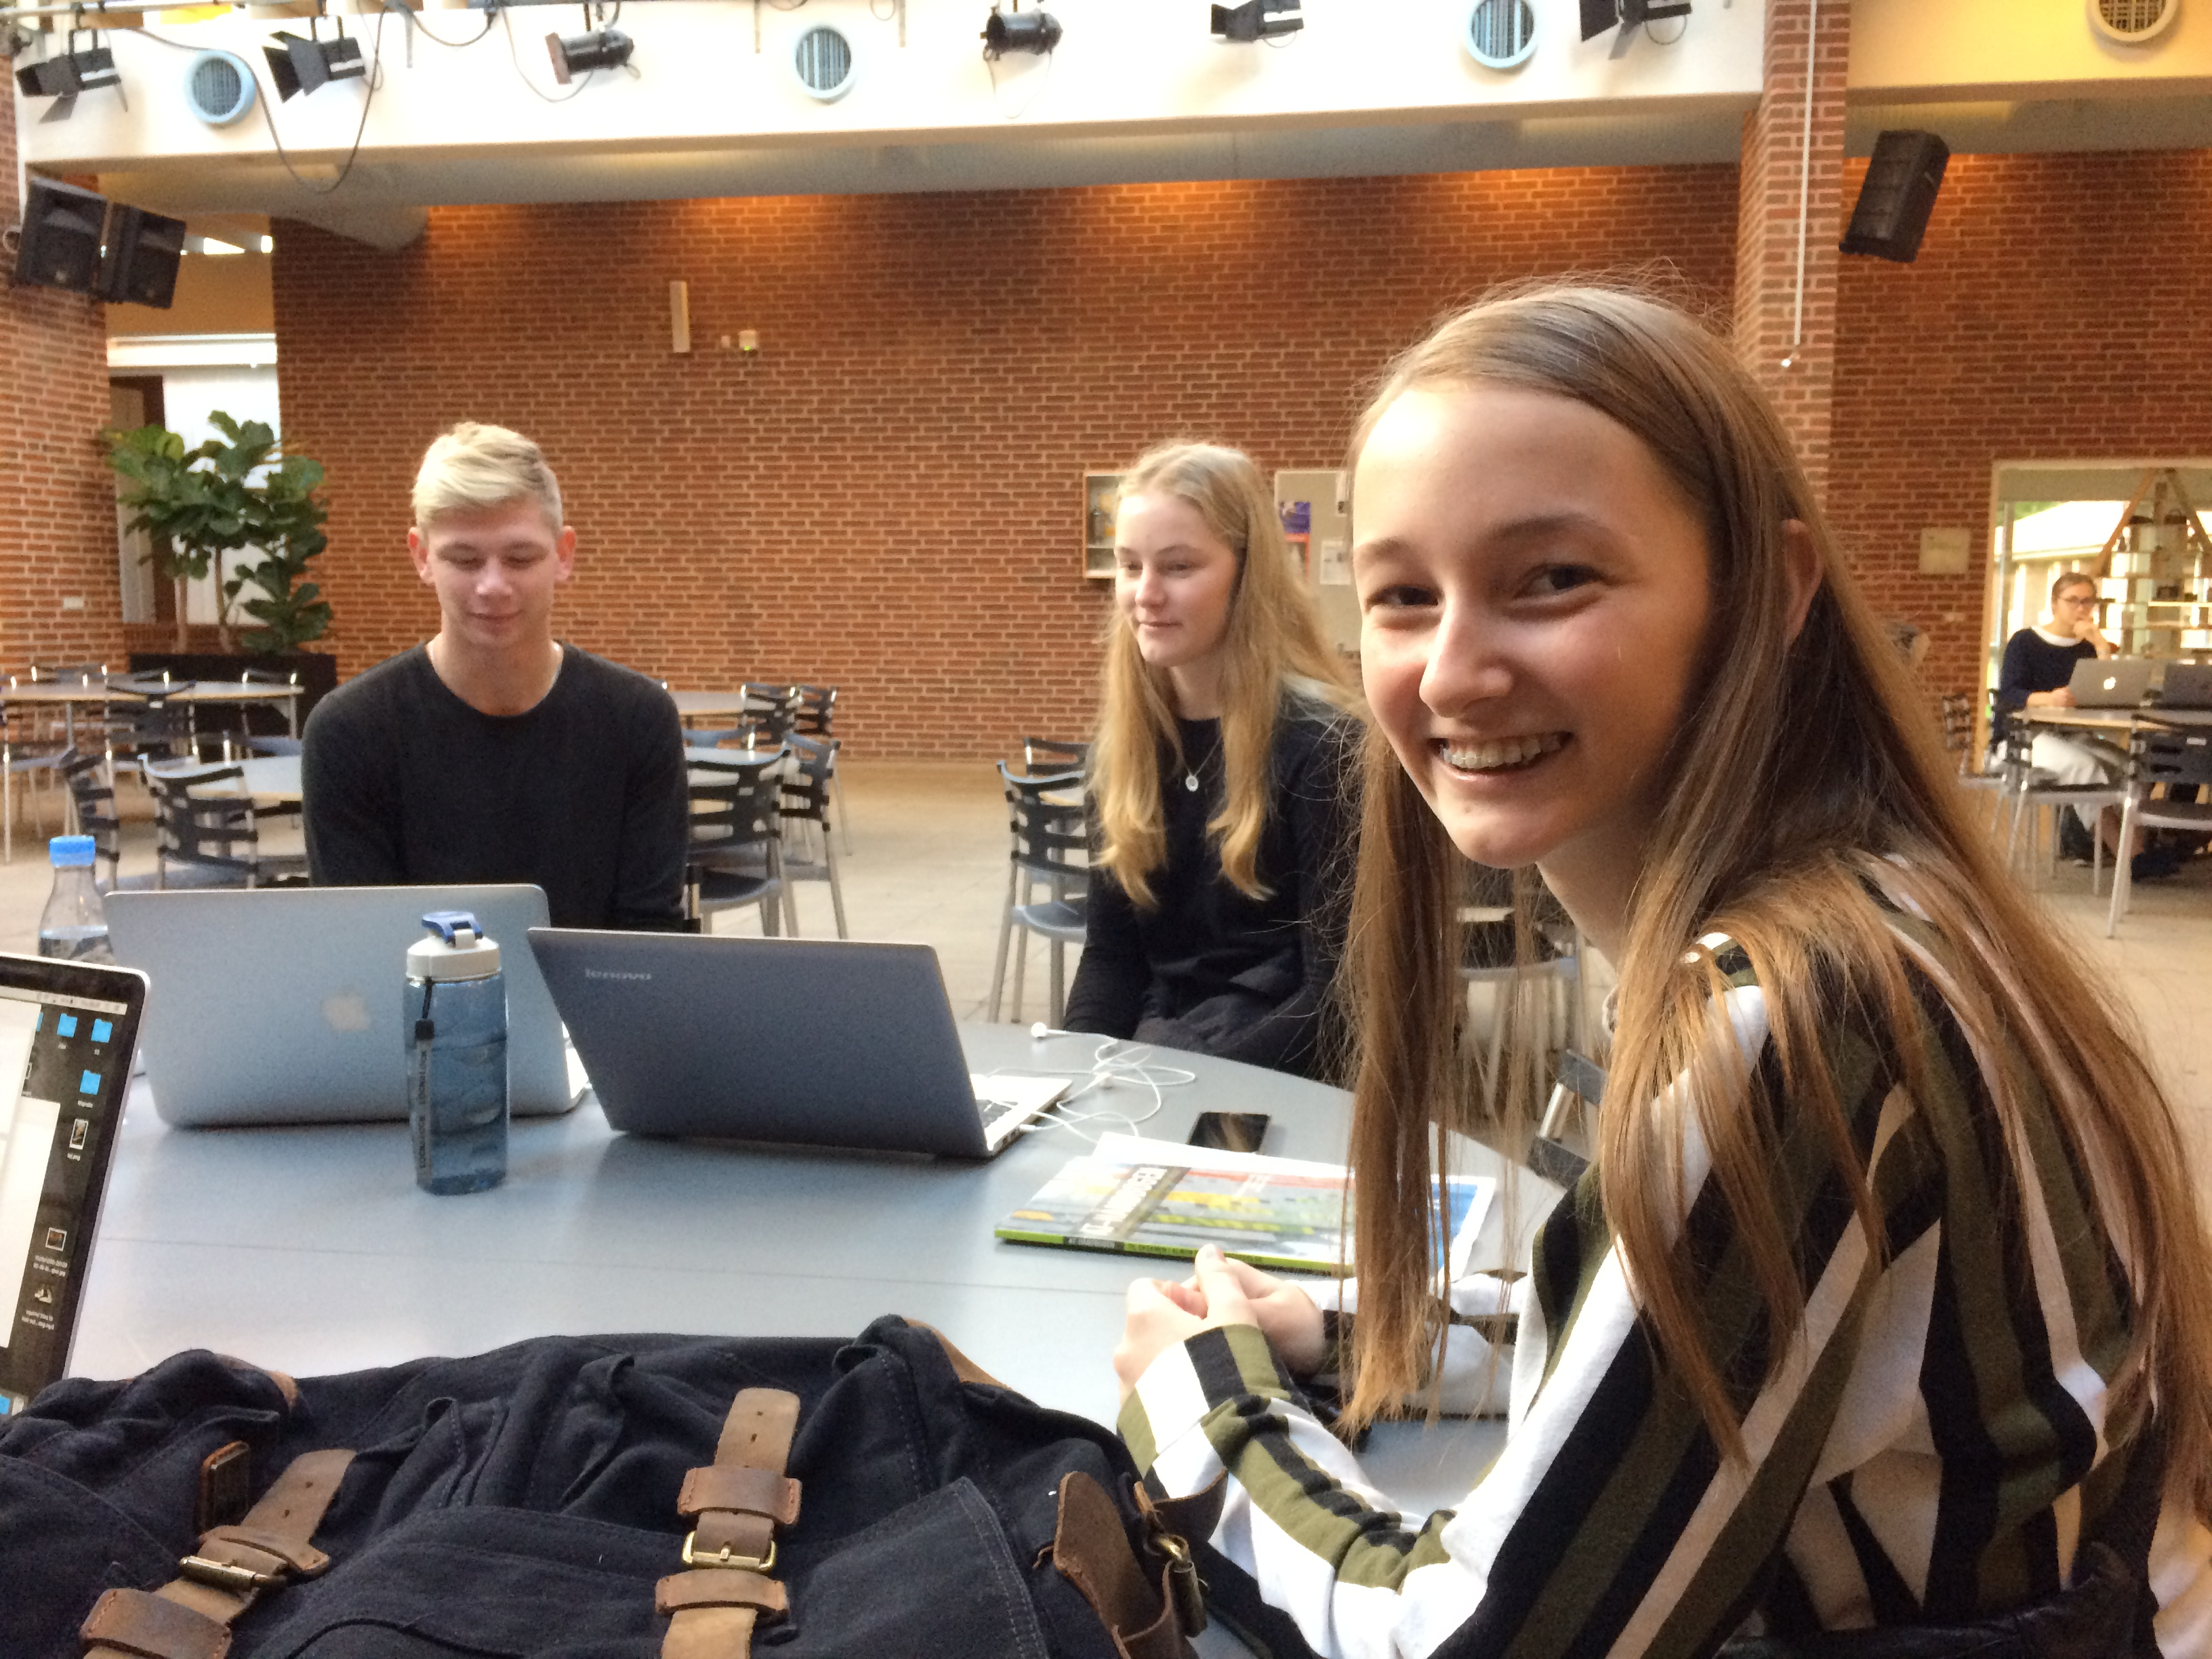 Katja Kejlstrup, Vejen Gymnasium